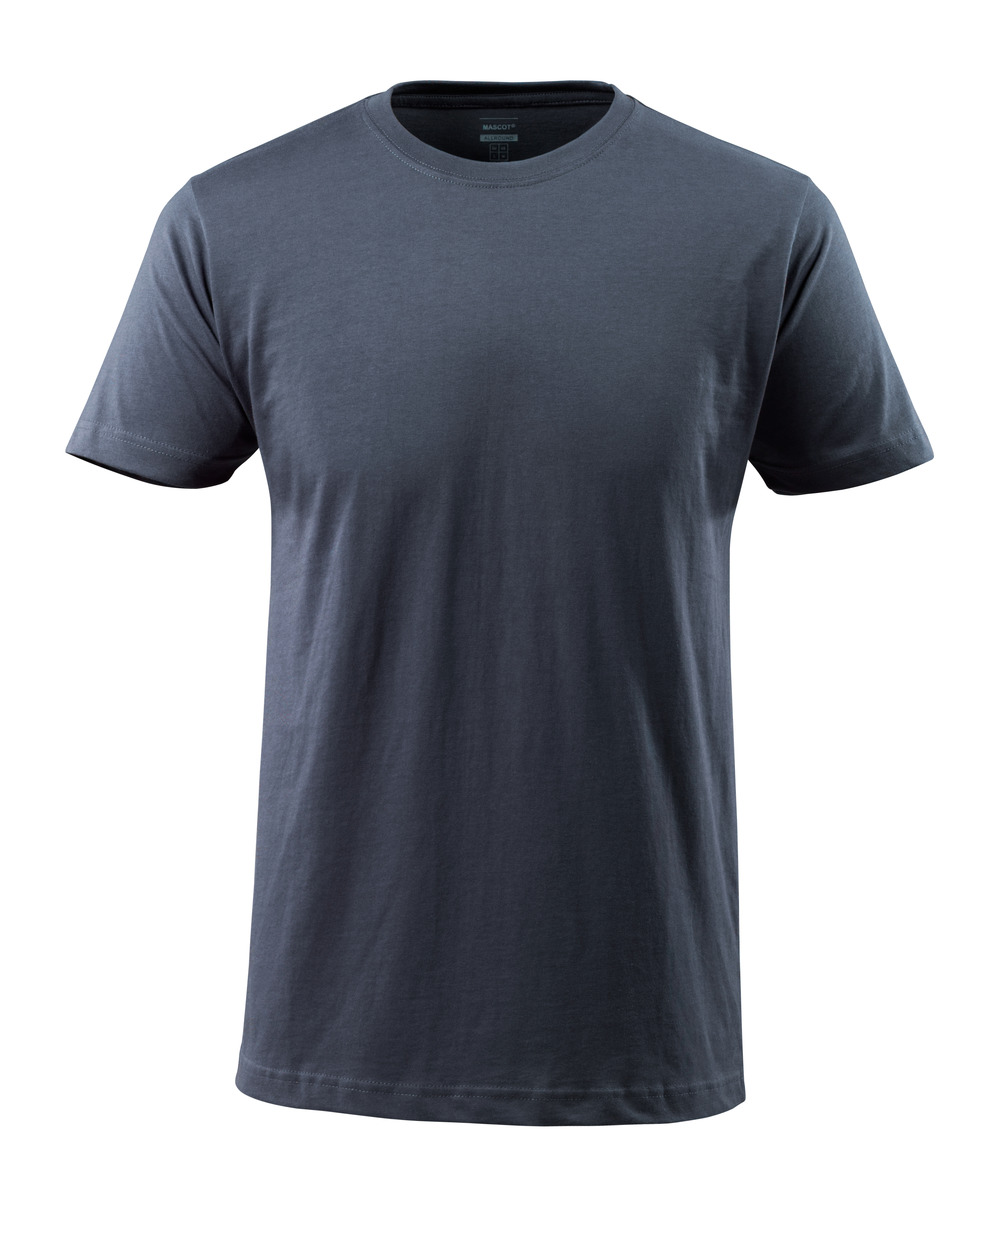 50662-965-010 T-shirt - mørk marine